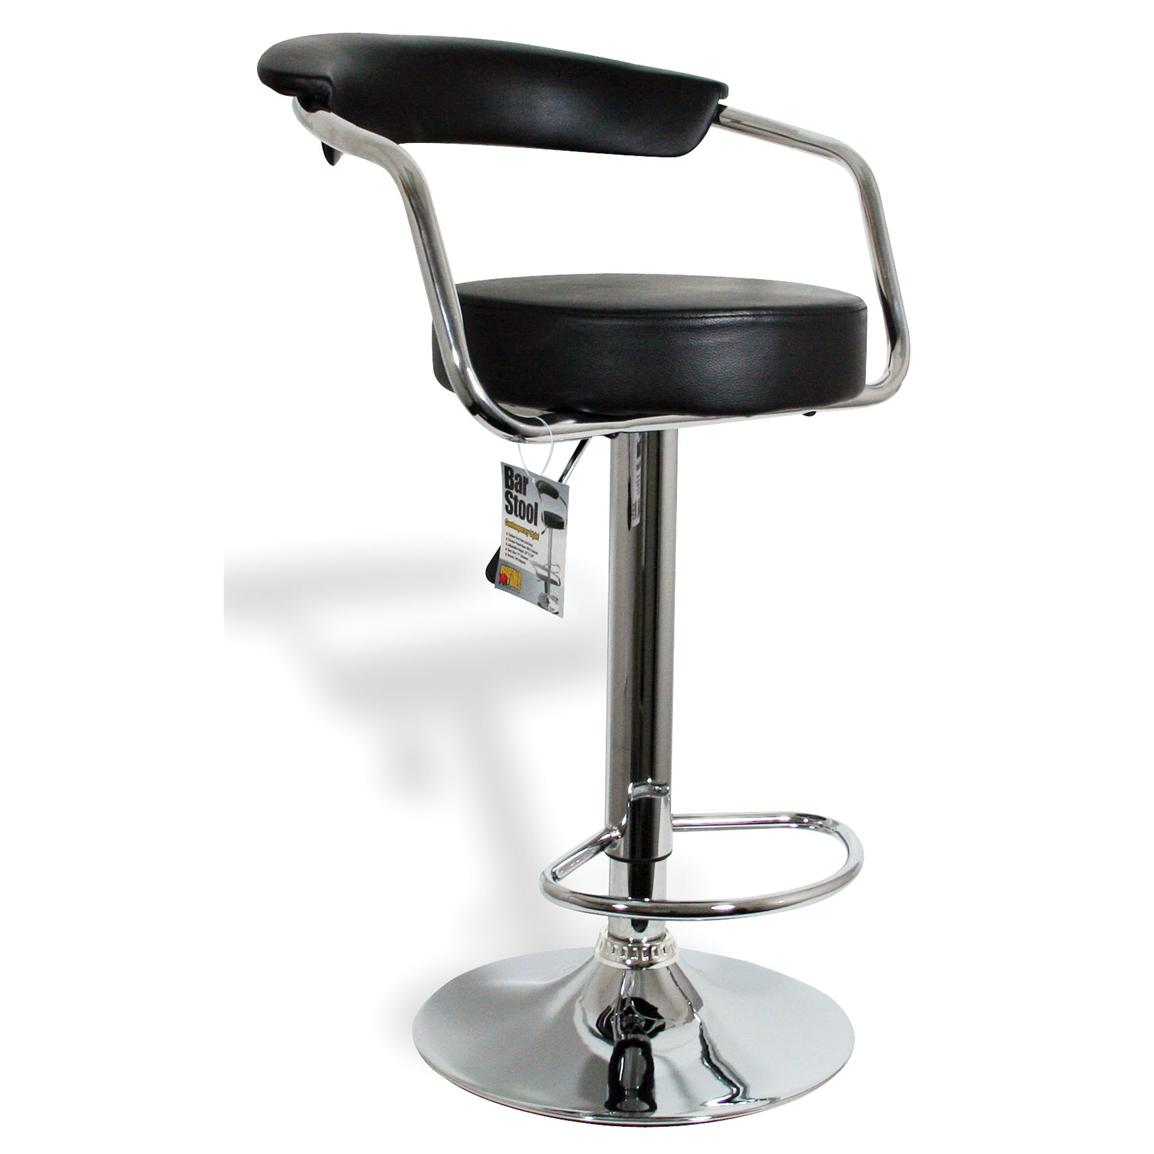 adjustable bar stool with backrest and armrests adjustable bar stool with backrest - buffalo height-adjustable bar stool OHFMWAJ